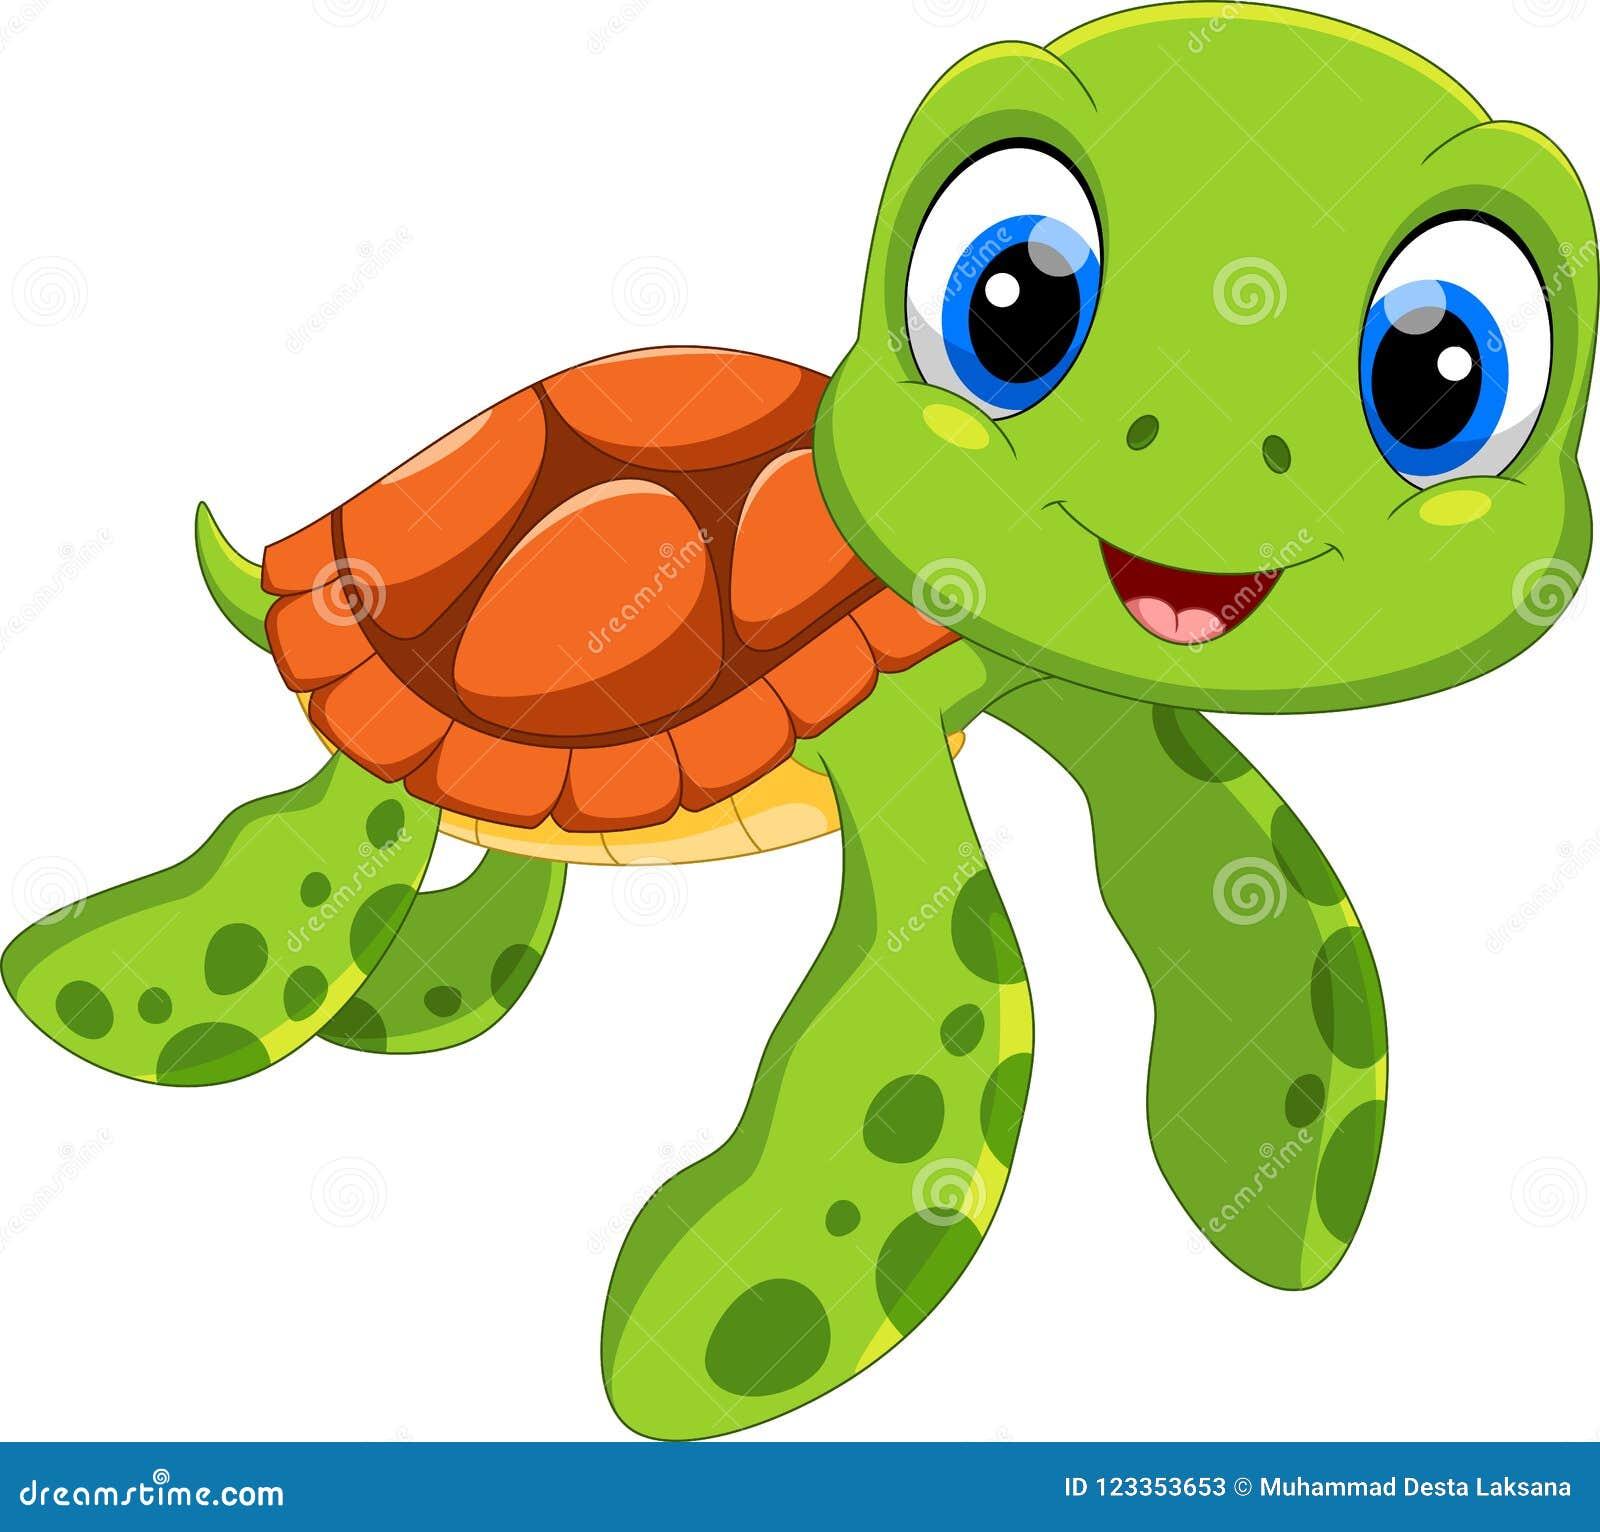 Cute Sea Turtle Cartoon. Funny And Adorable Stock ...